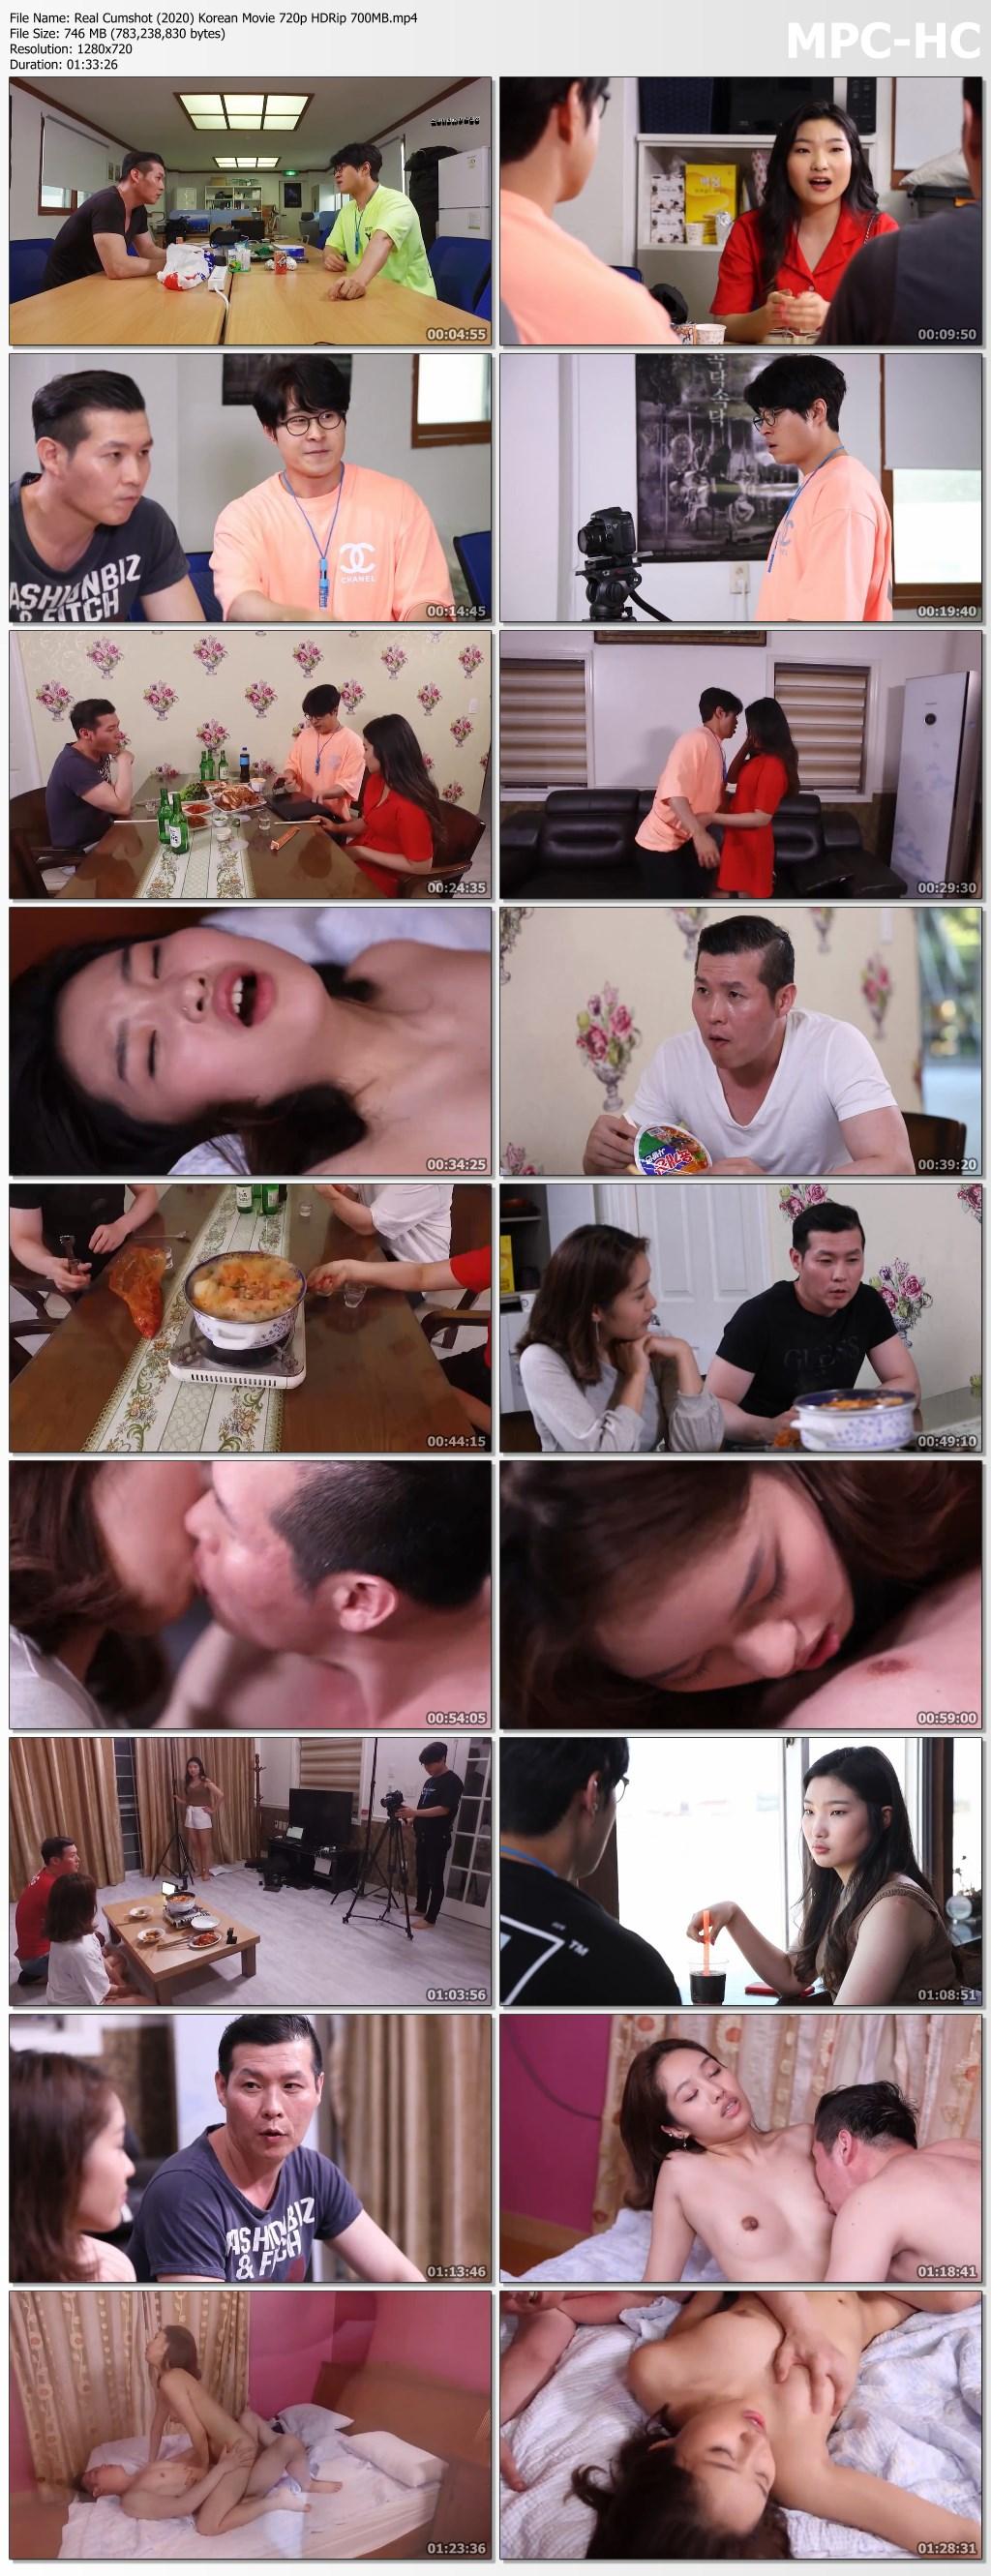 Real Cumshot (2020) Korean Movie 720p HDRip 700MB.mp4 thumbs